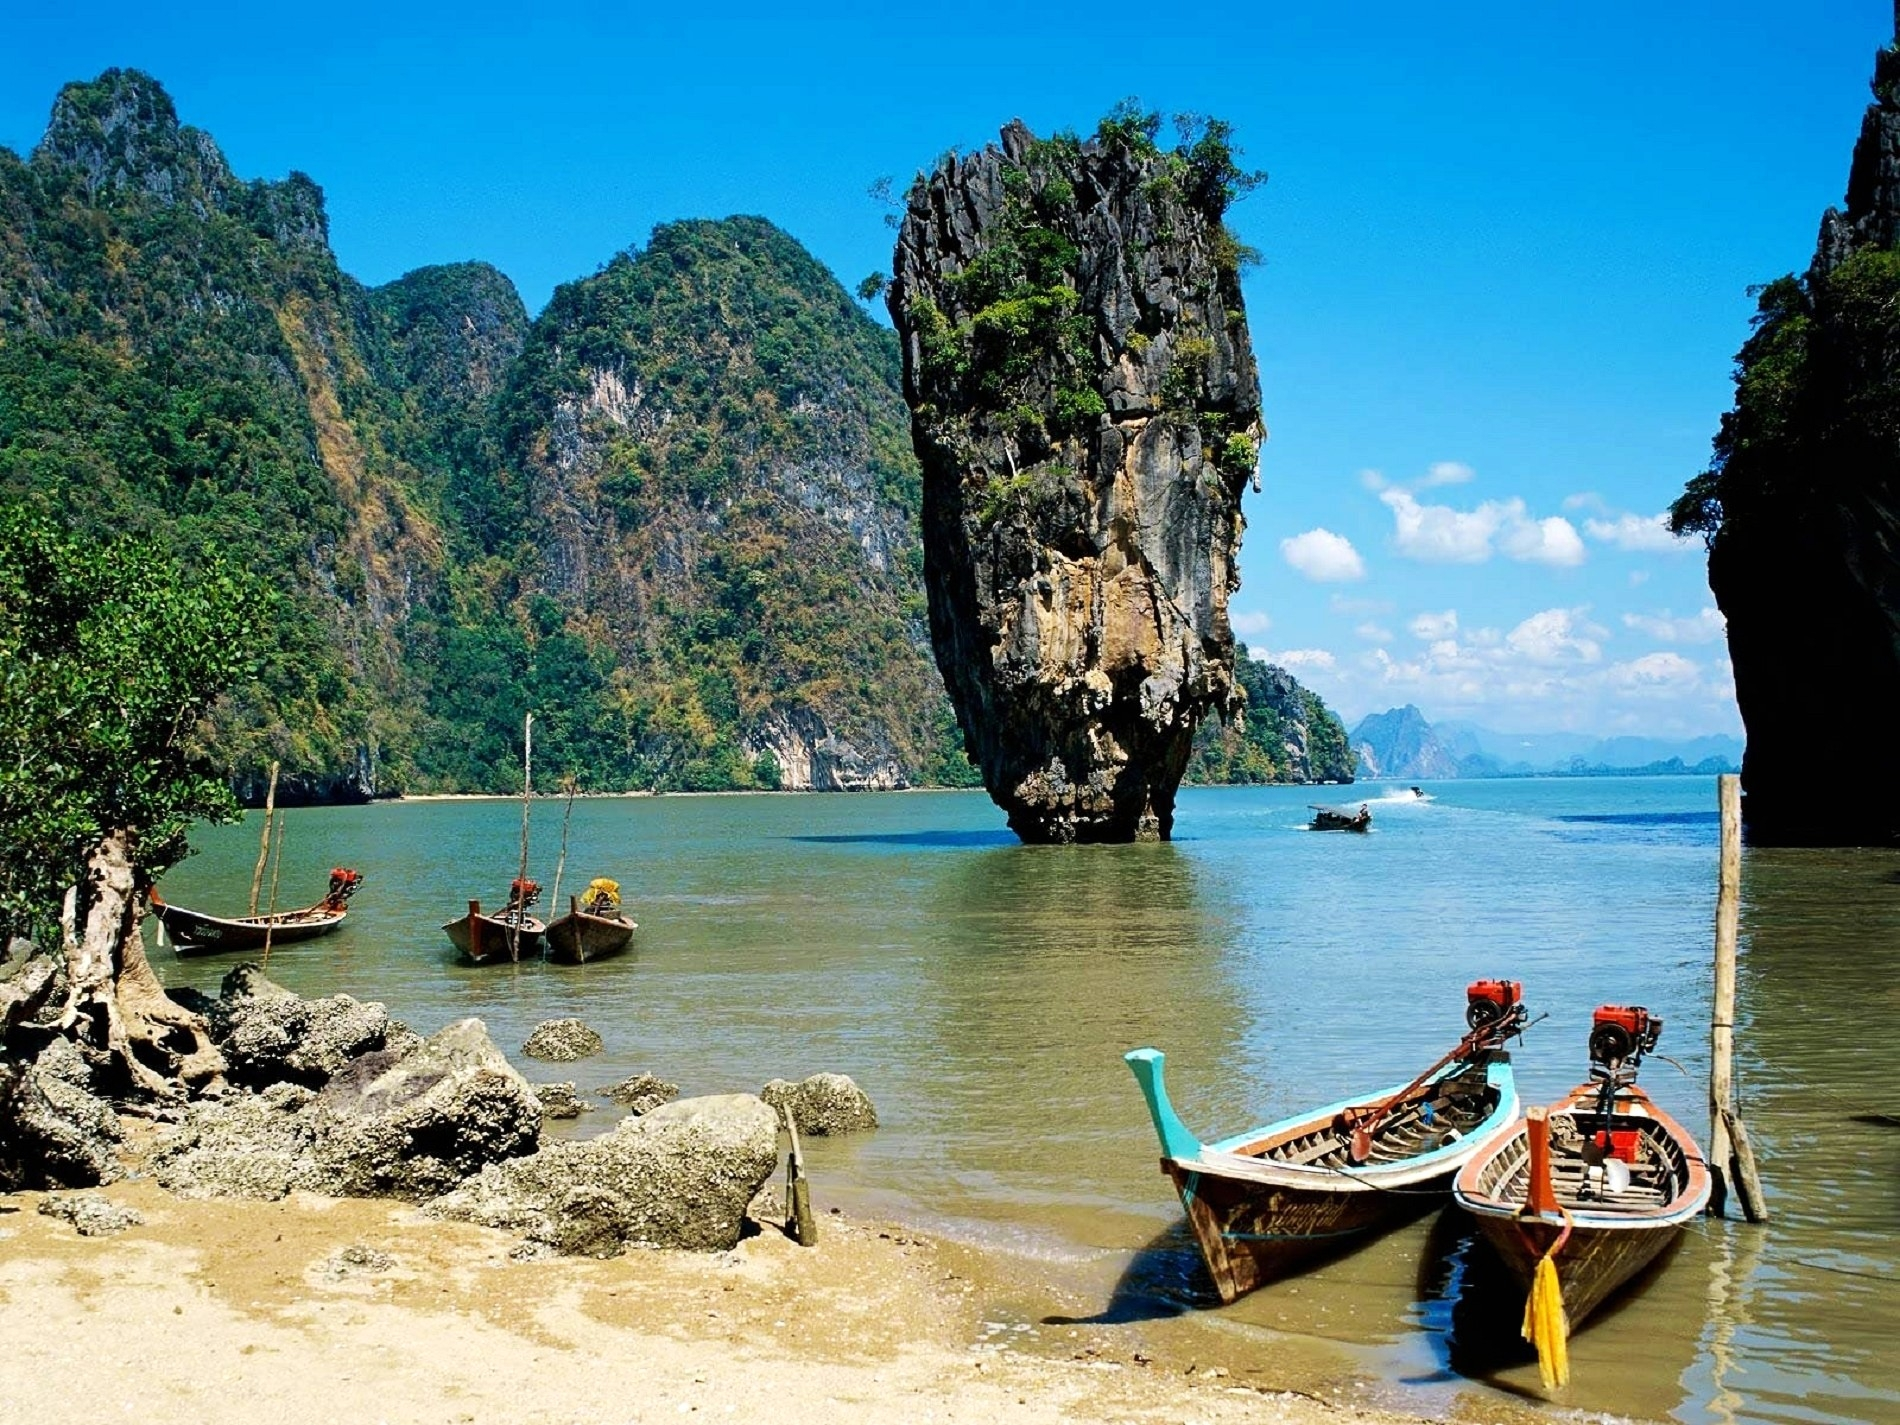 73224 Заставки и Обои Лодки на телефон. Скачать Природа, Таиланд, Пляж, Тропики, Море, Лодки картинки бесплатно